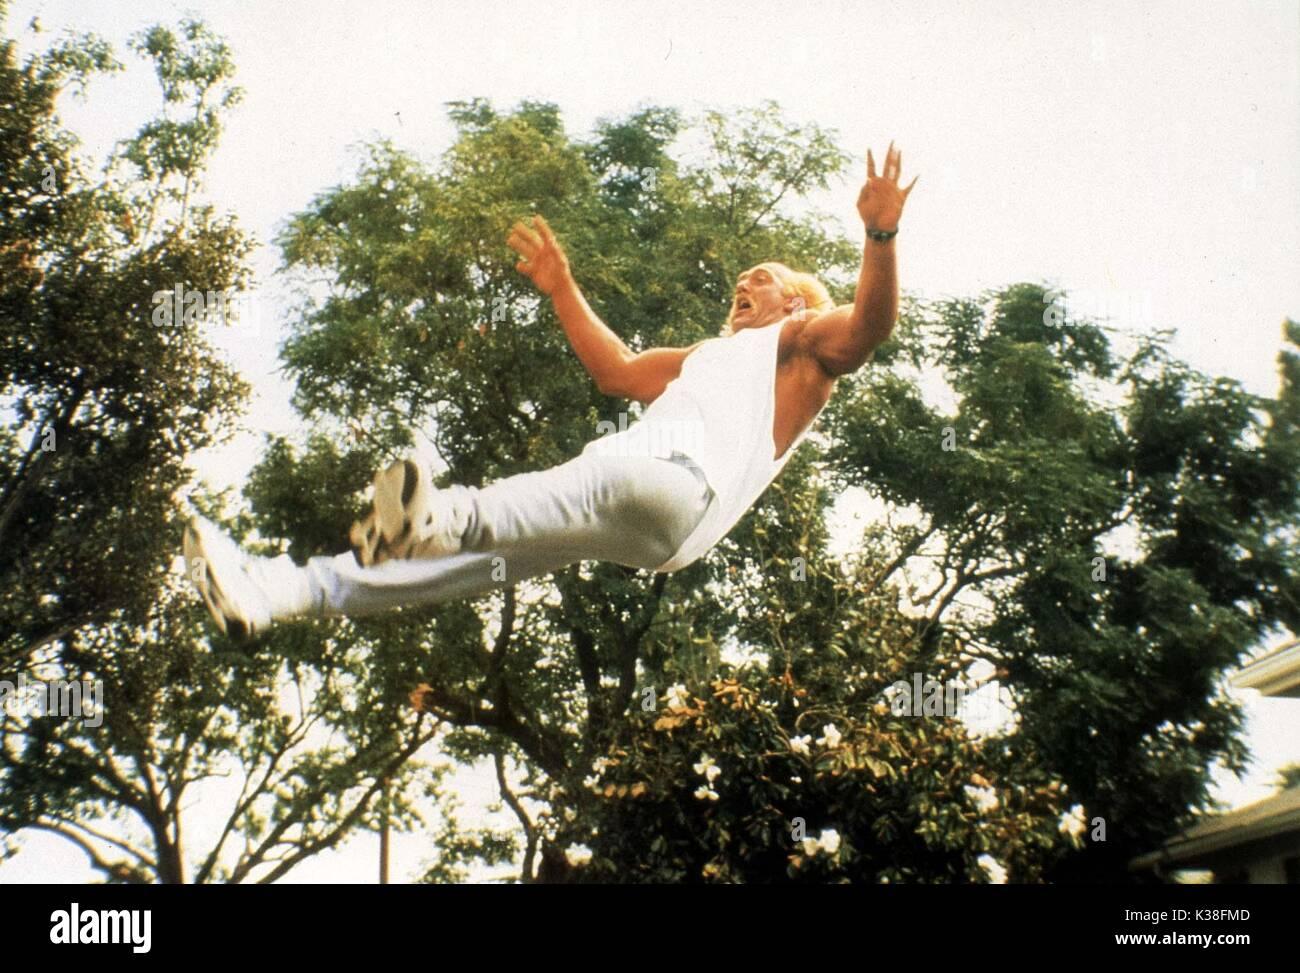 SUBURBAN COMMANDO HULK HOGAN DIRECTOR: BURT KENNEDY NEW LINE CINEMA     Date: 1991 - Stock Image